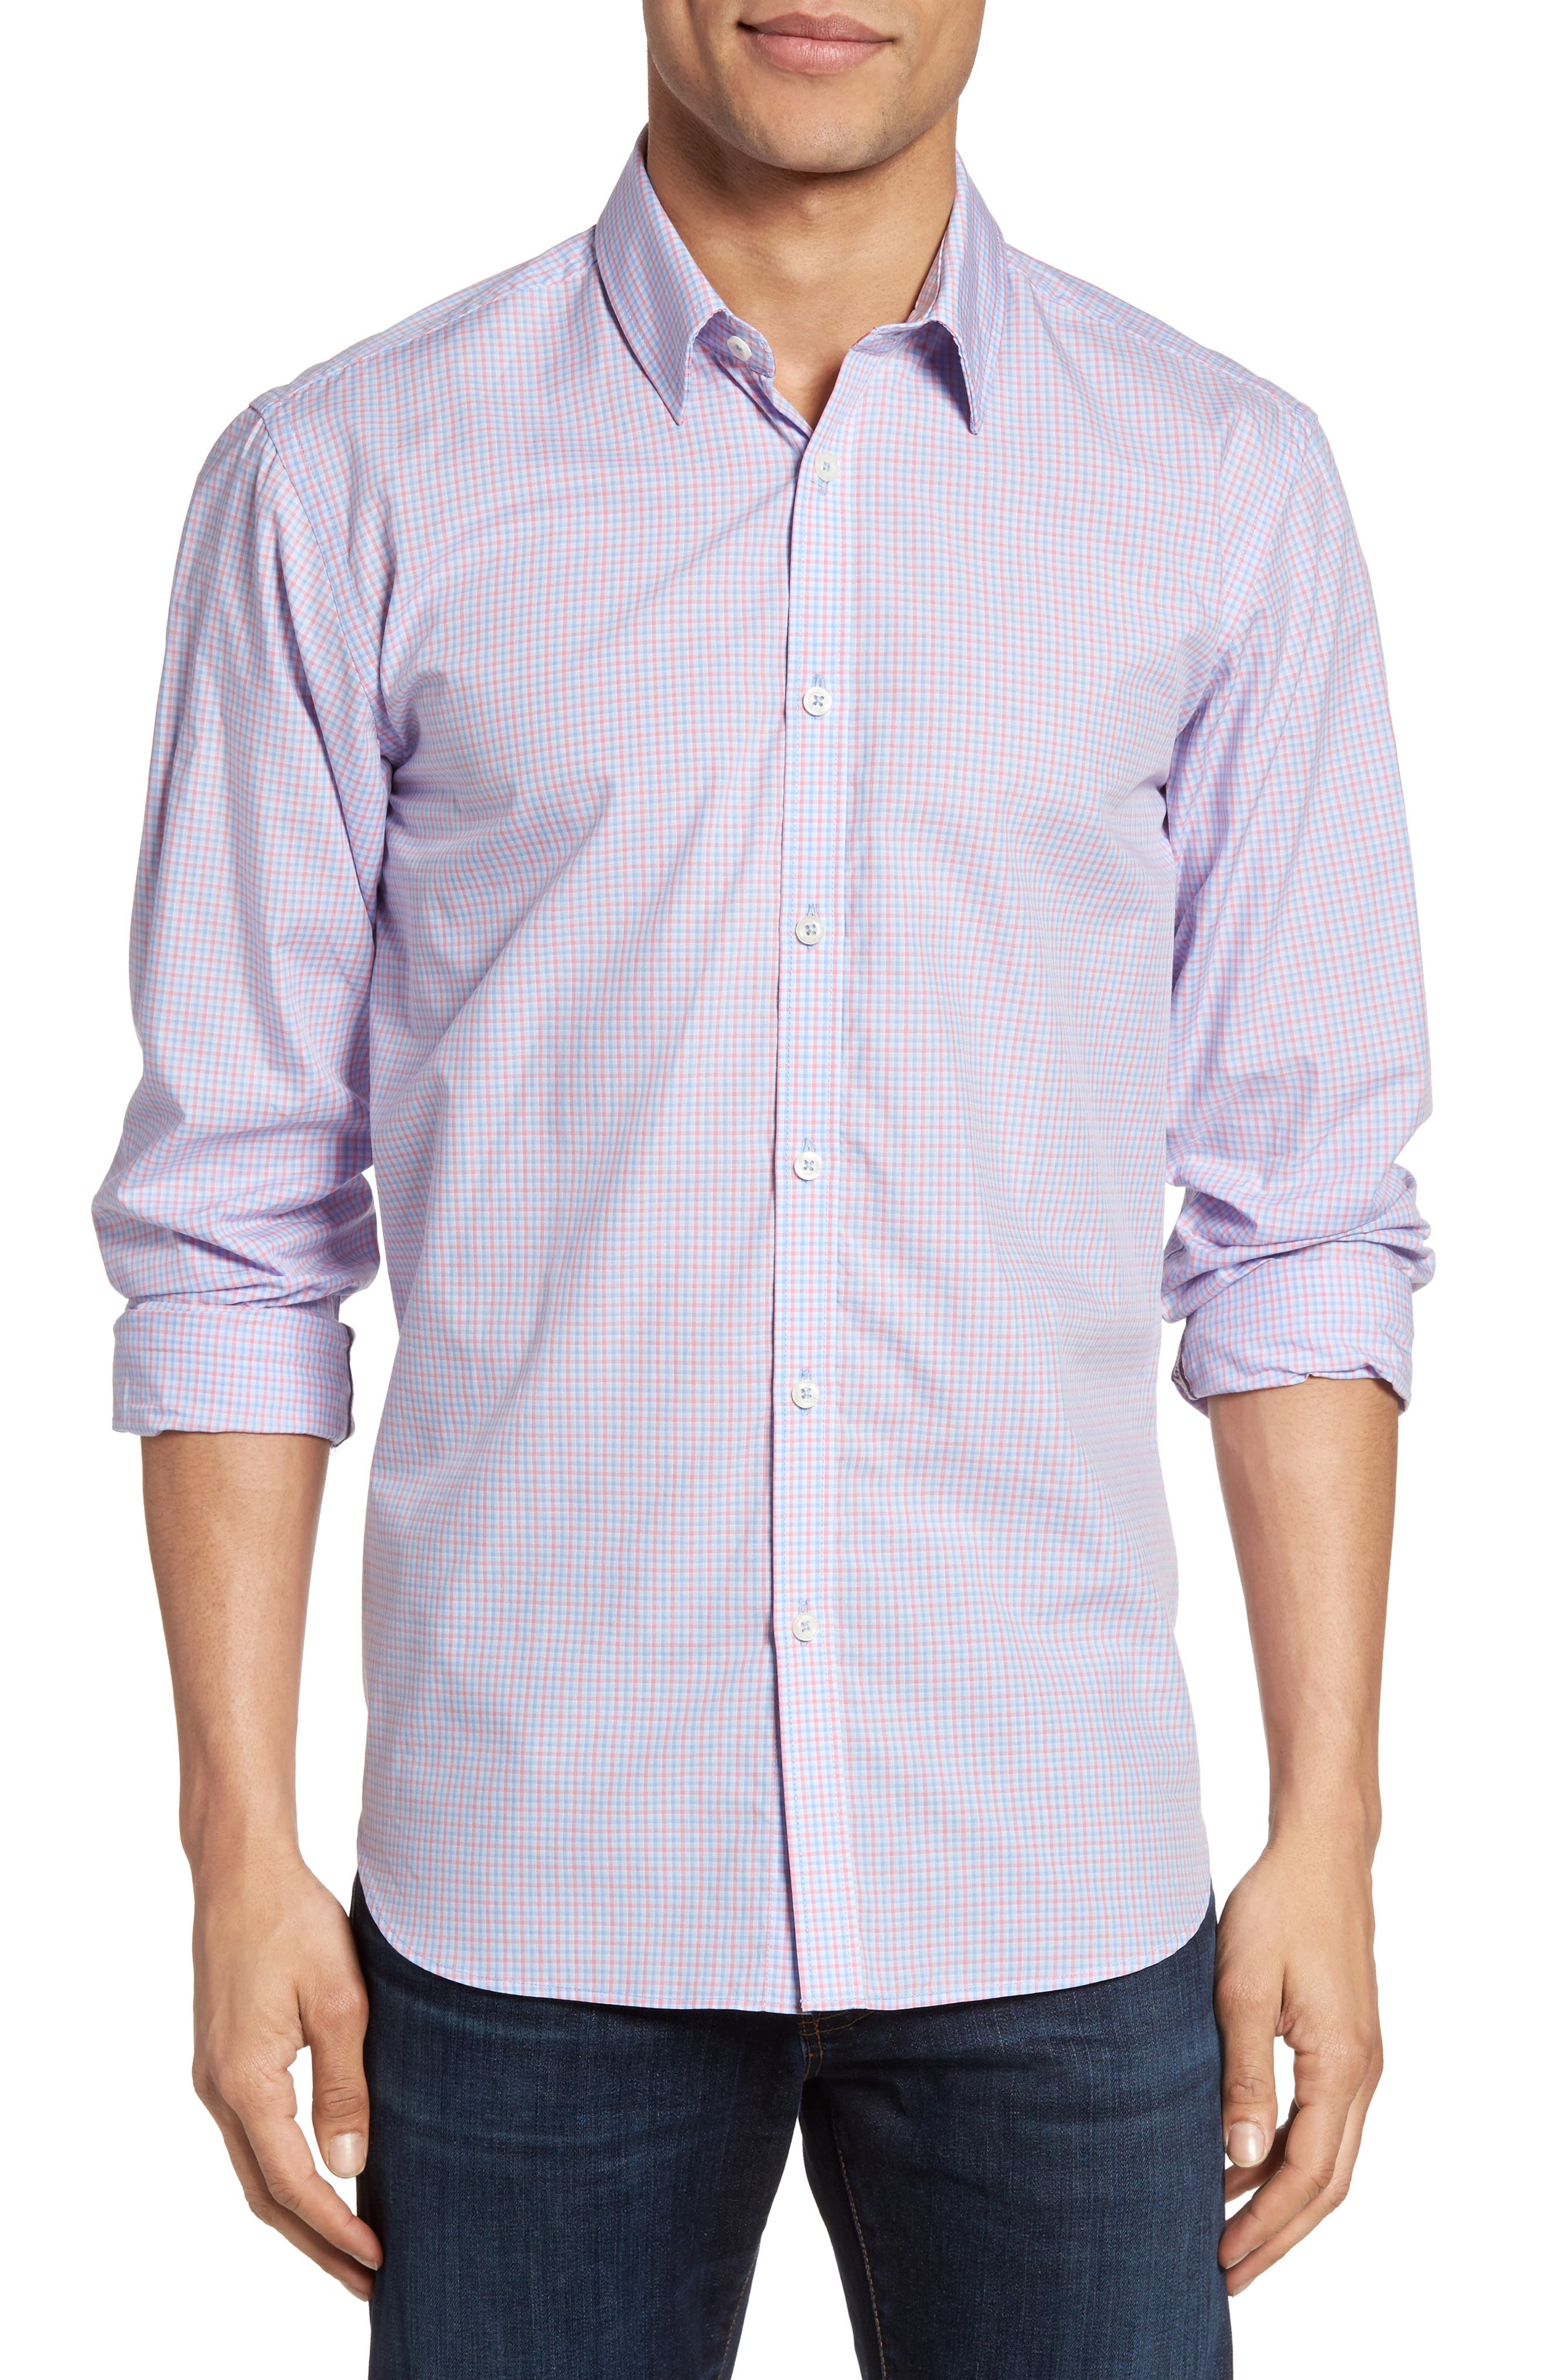 Jeremy Argyle Fitted Mini Check Sport Shirt